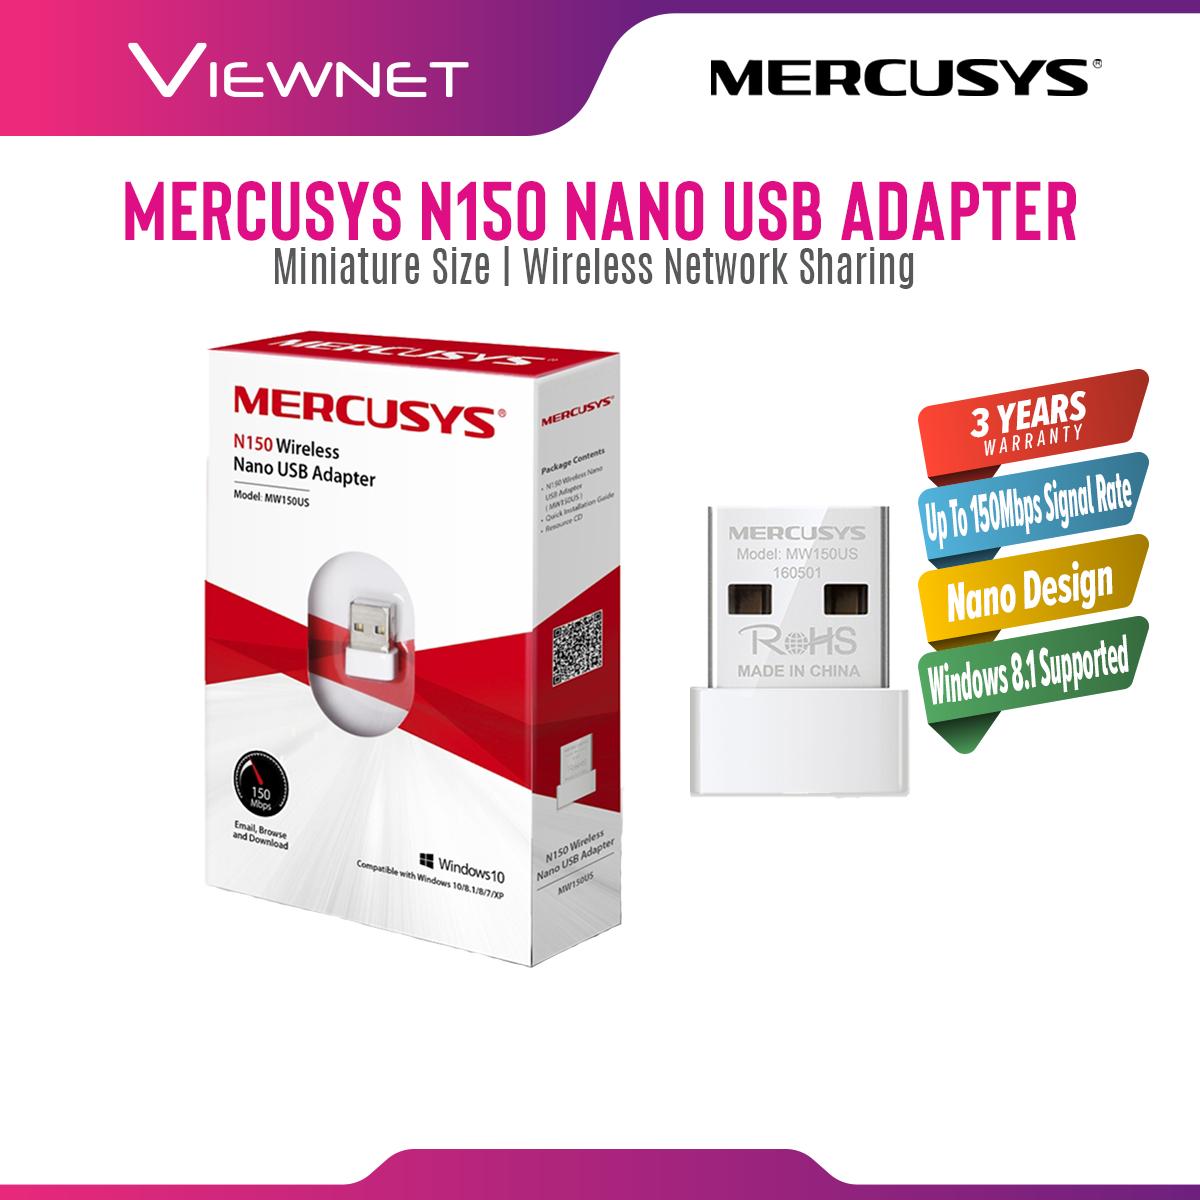 Mercusys MW150US Wireless N150 Nano USB Wireless WiFi Adapter (Powered TP-Link)